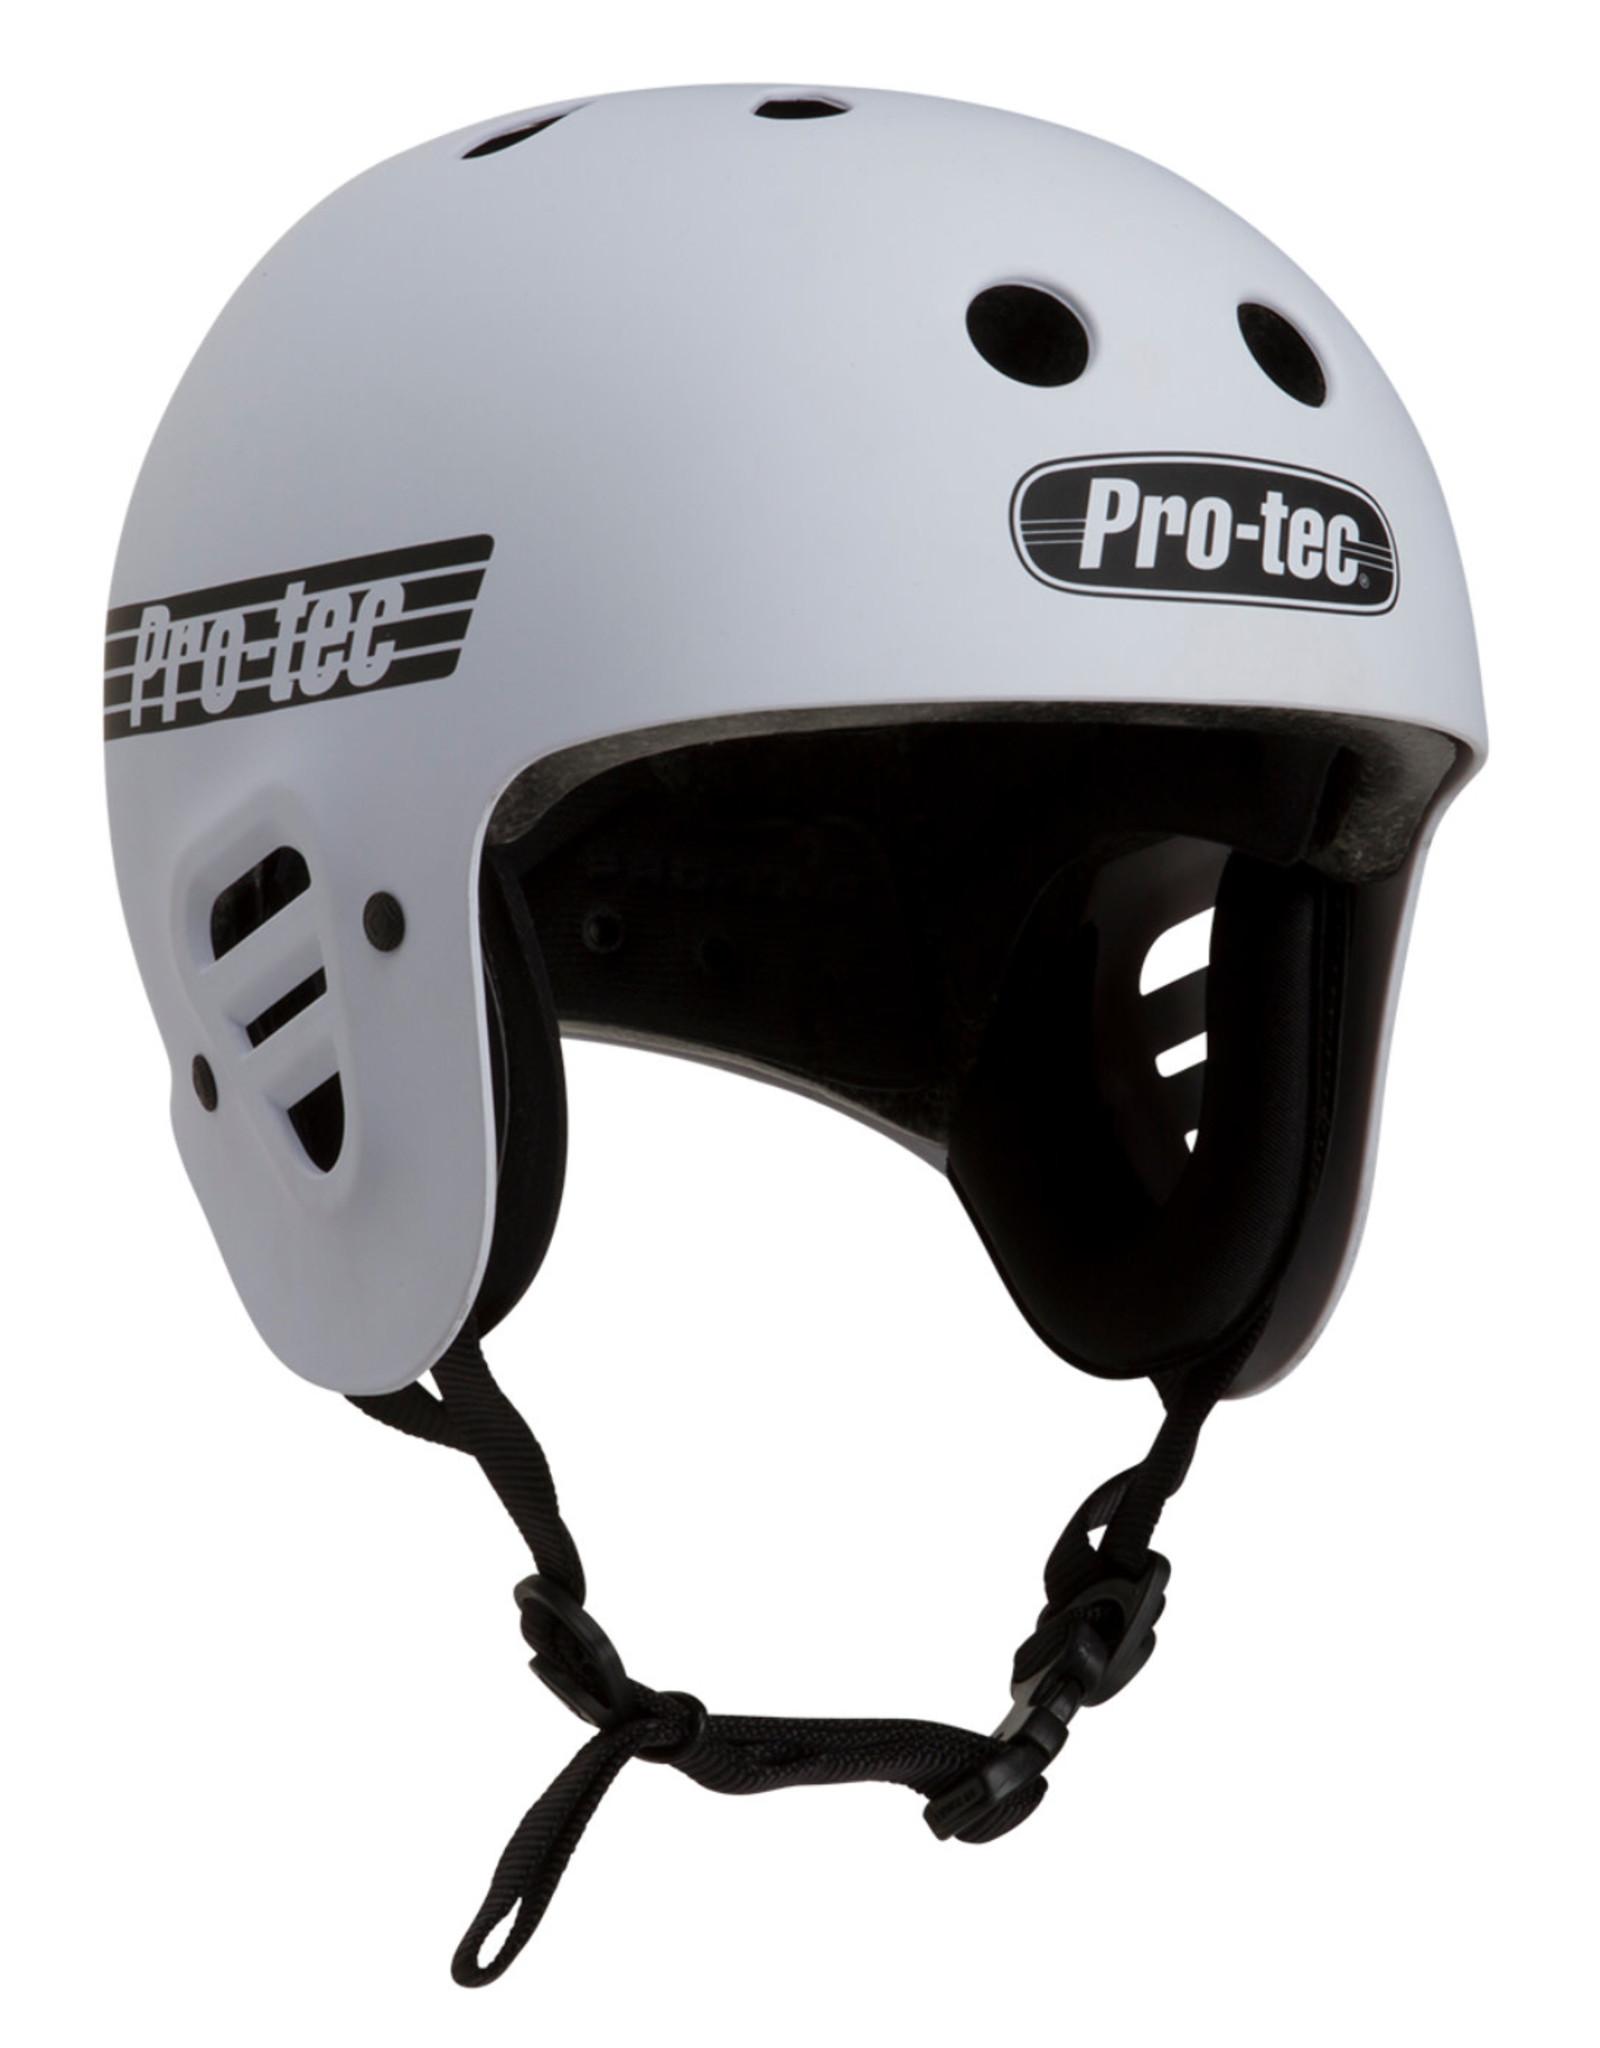 Pro-Tec Full Cut Certified Helmet